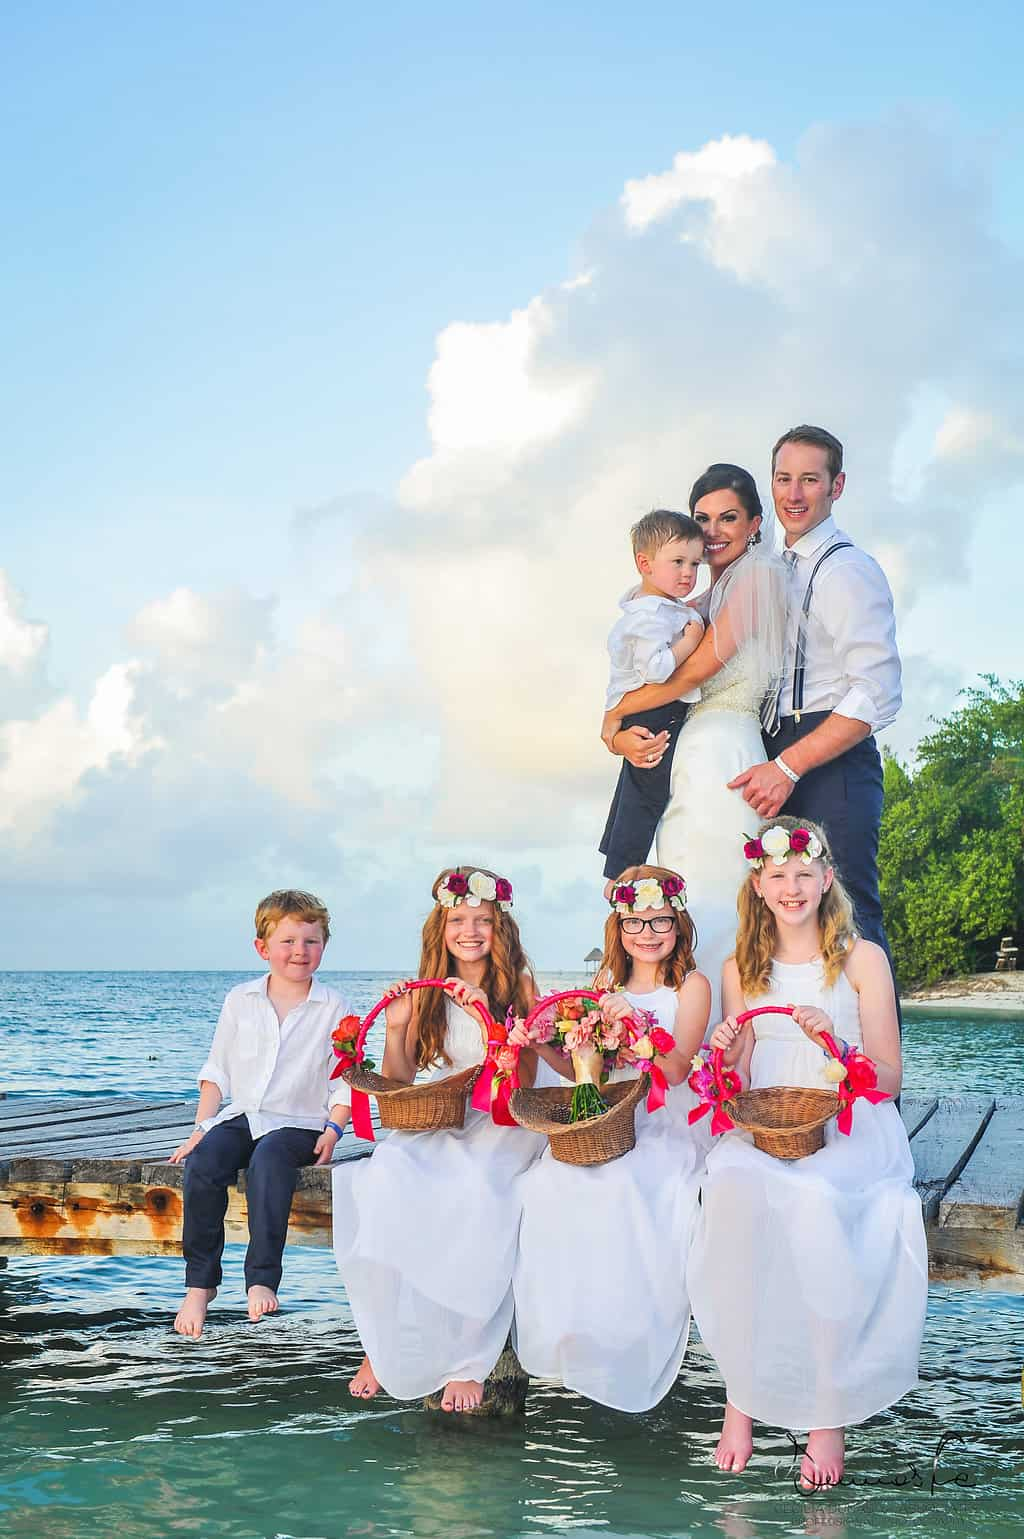 islamujeres-zama-weddingphotography-lindseysalvatore65